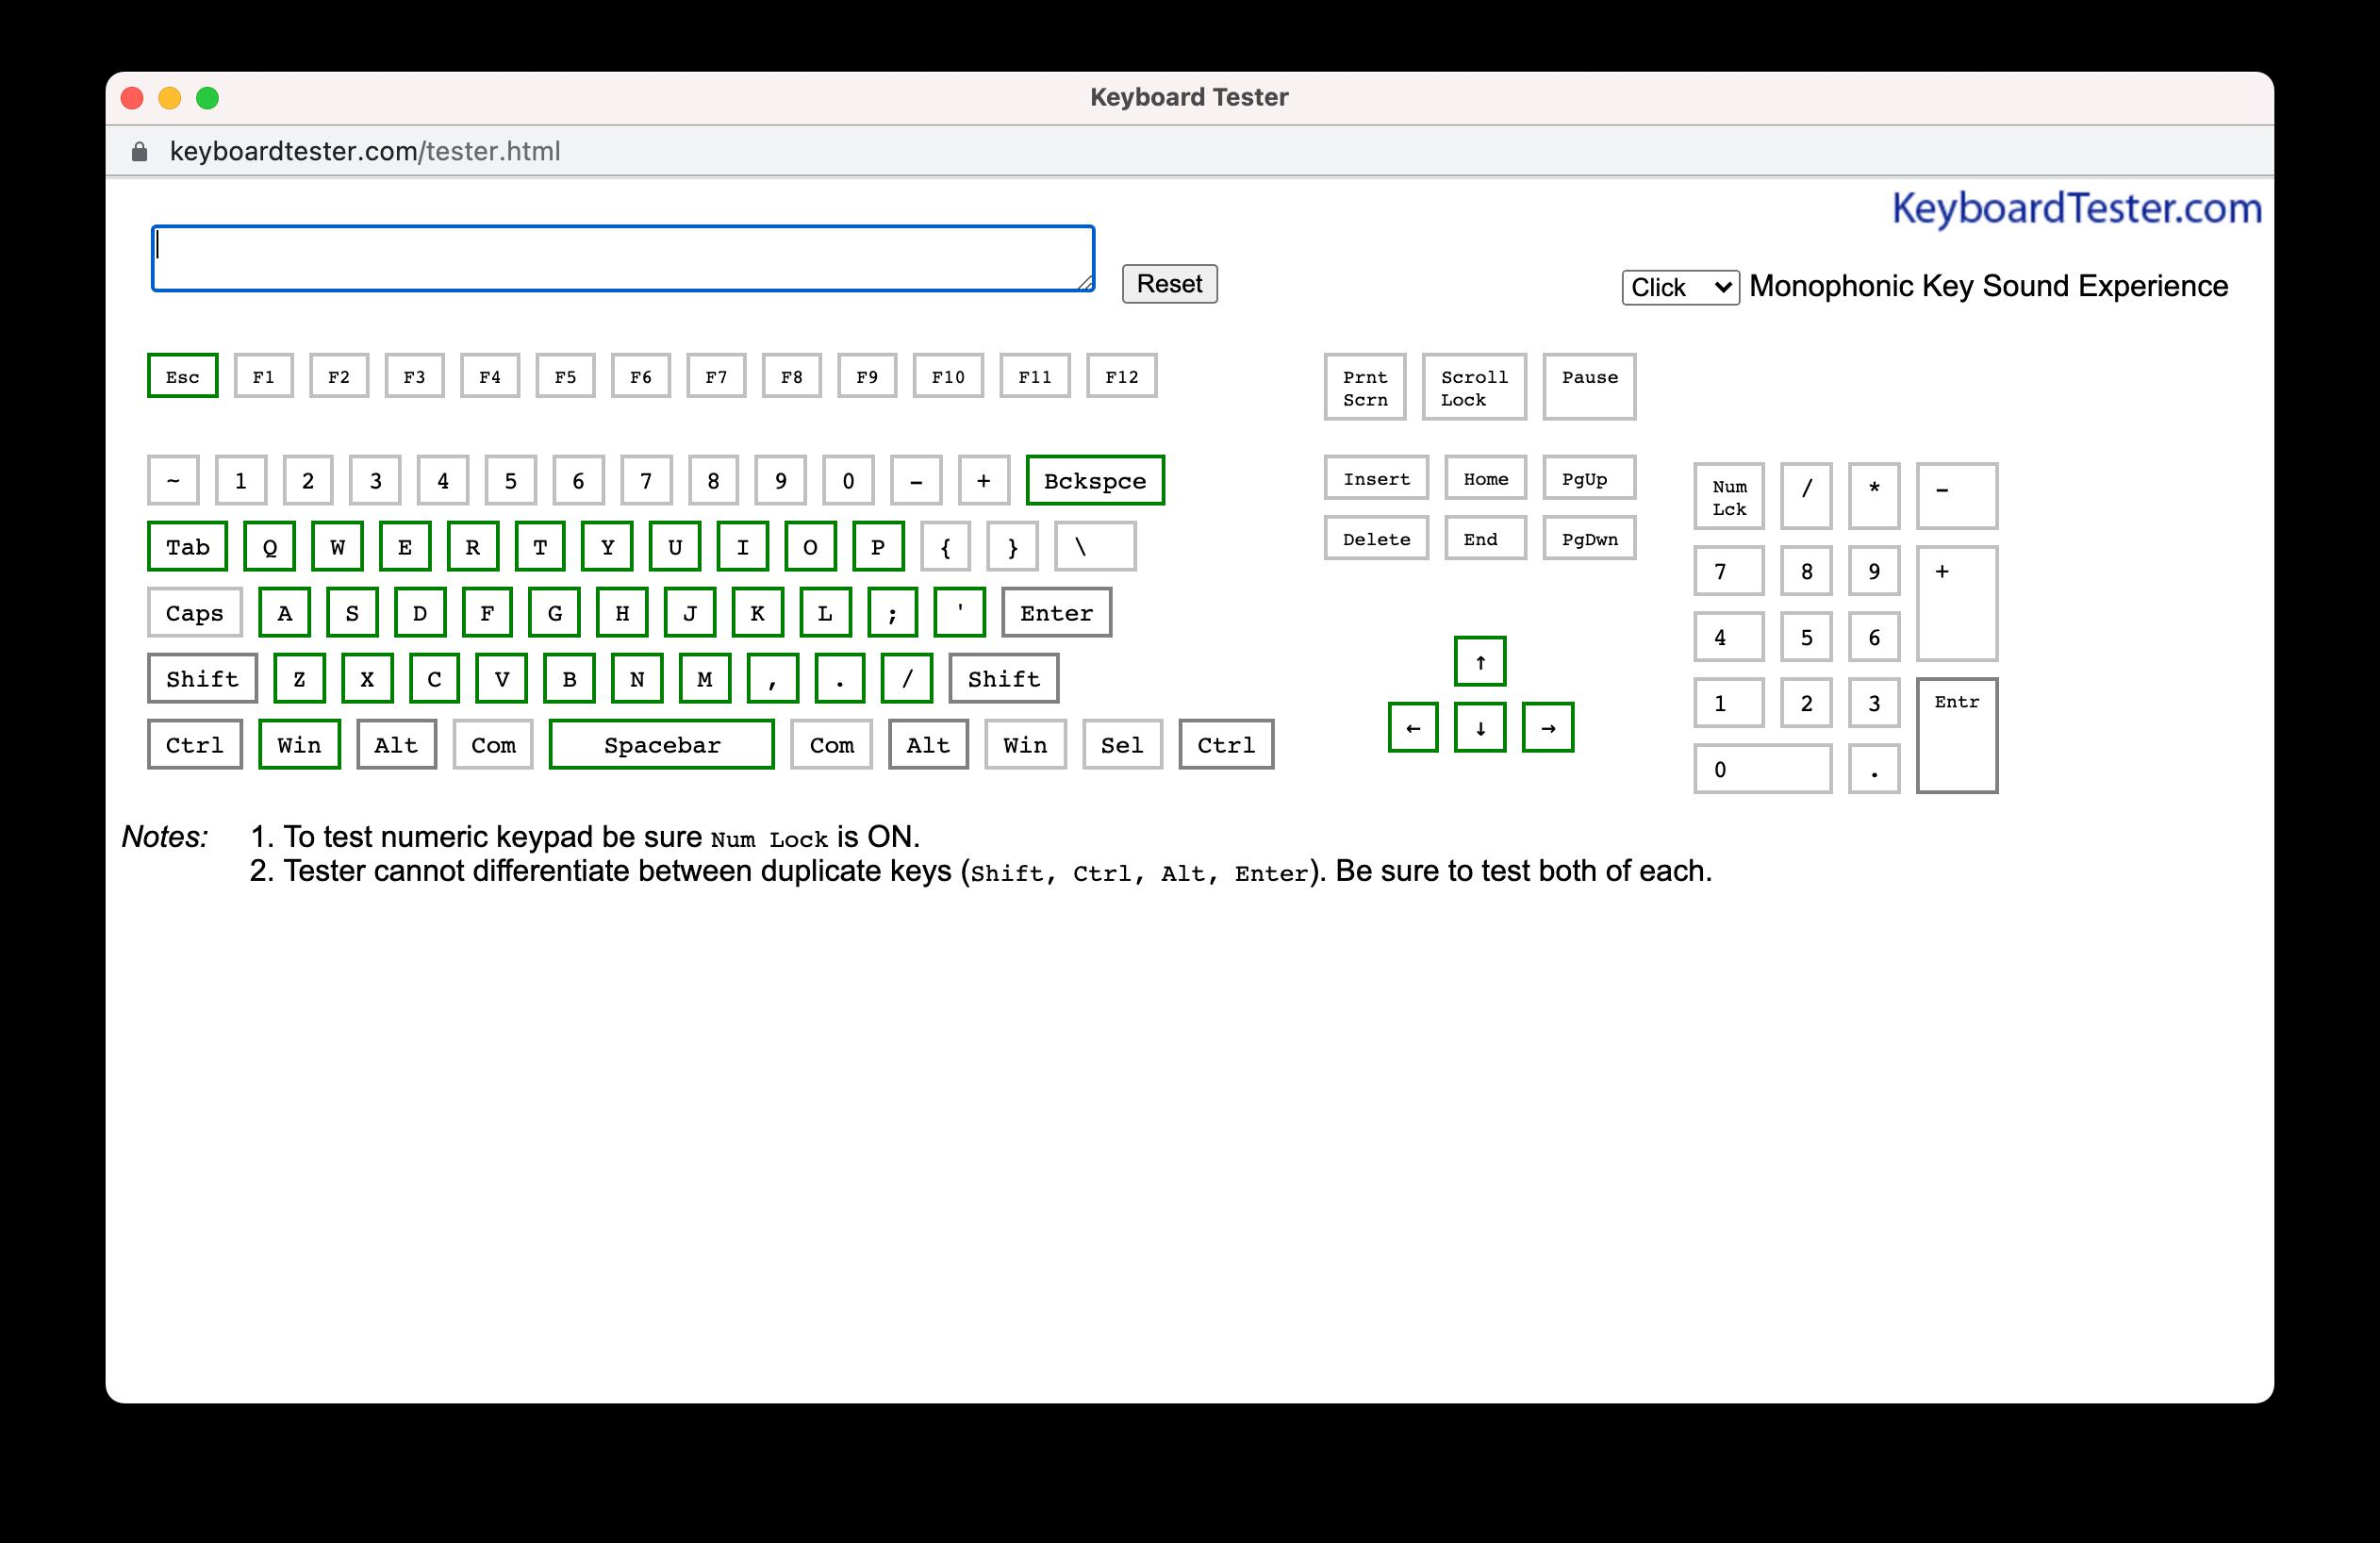 KeyboardTester.com